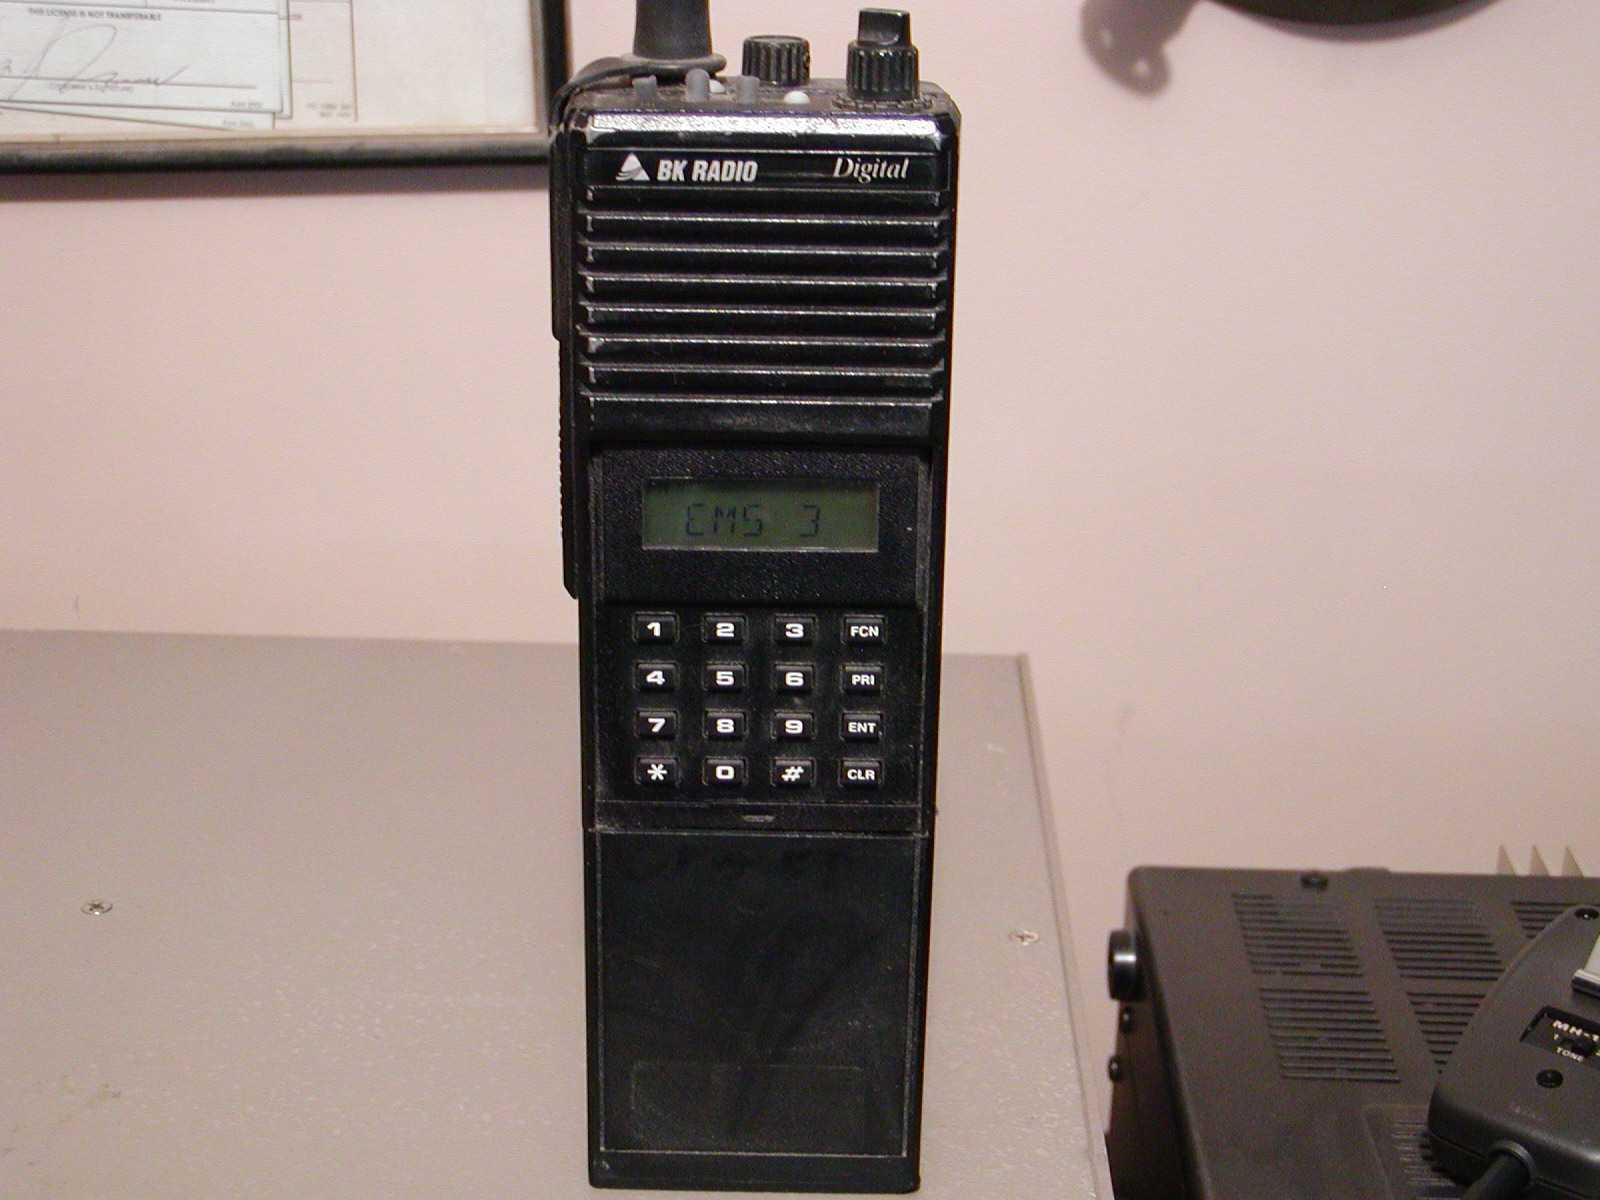 Programming from computer AN/PRC-127 BK Radio DPHx5102x ...